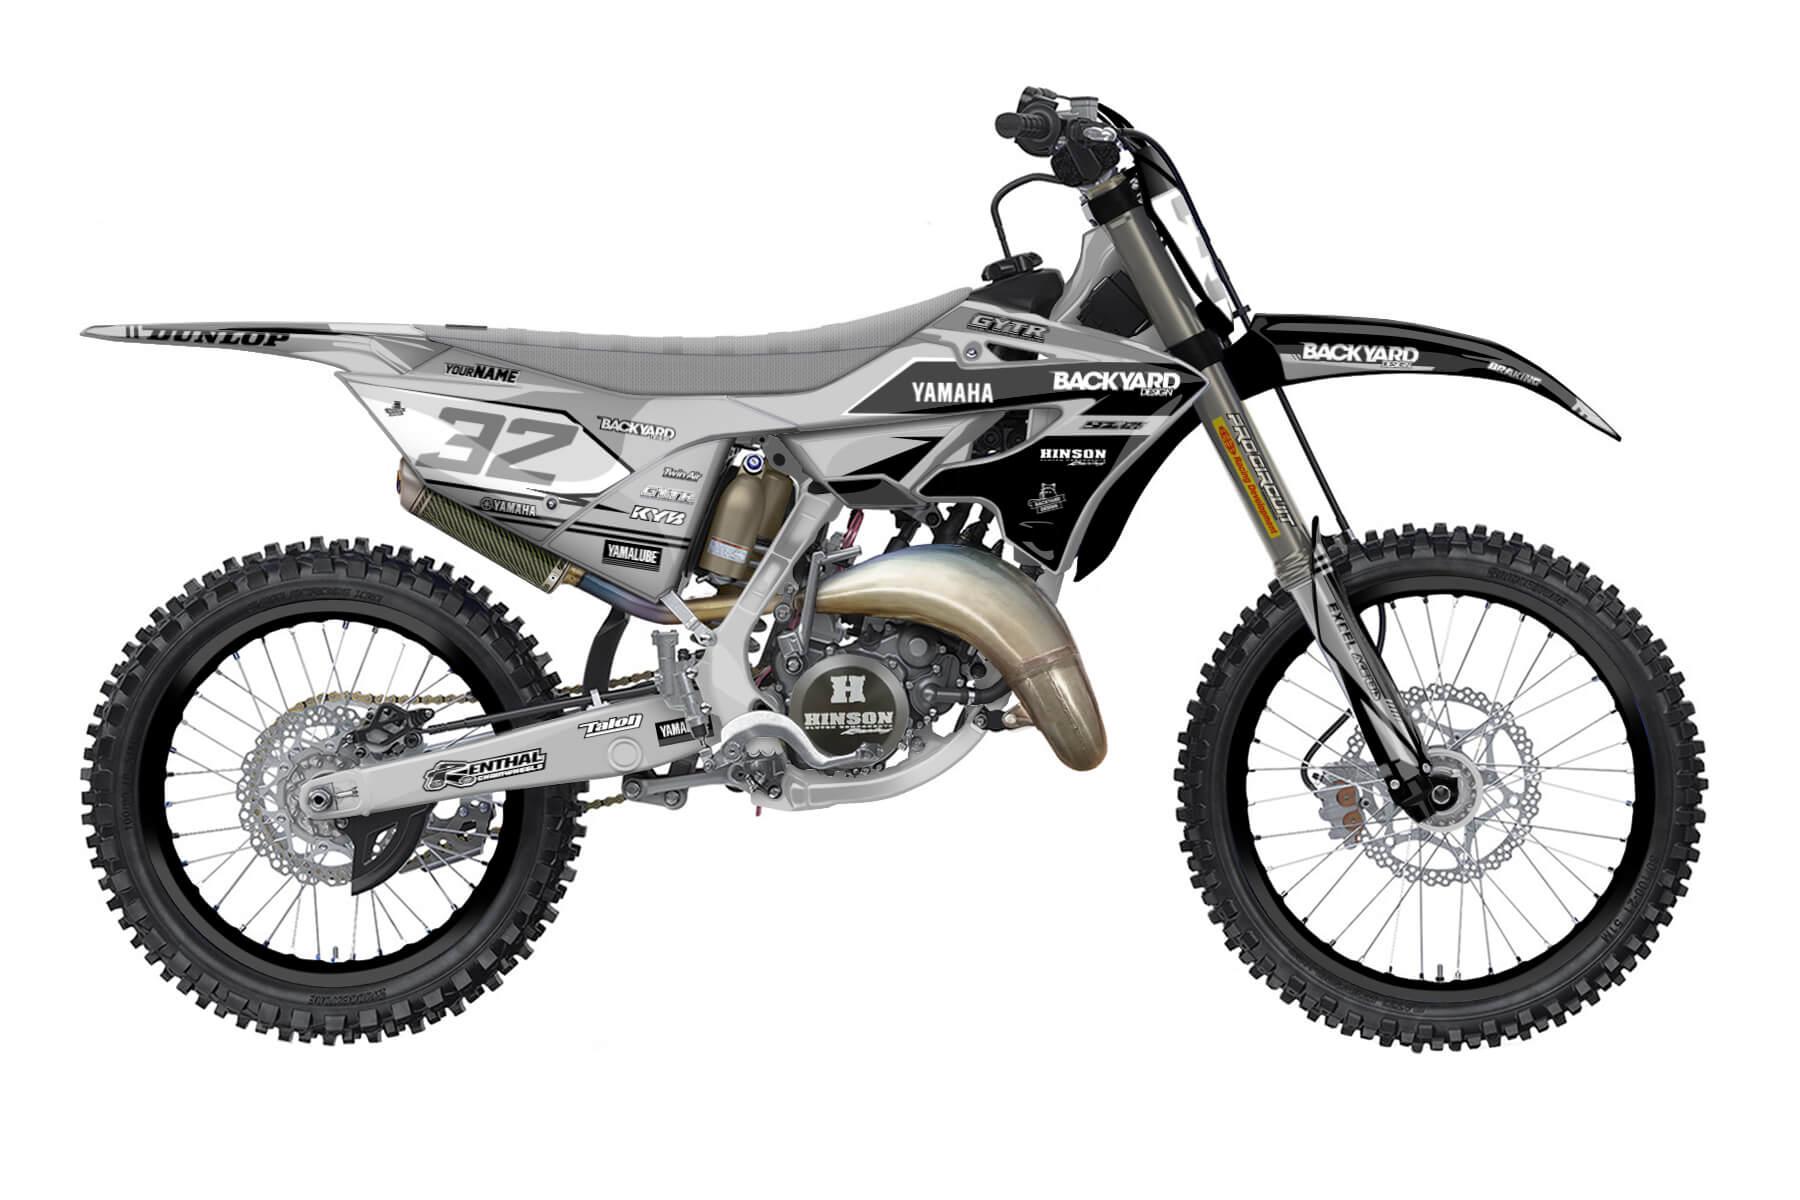 Yamaha YZ 250 - 2022 - Backyard Design - Mx Dekor - Modified Pro